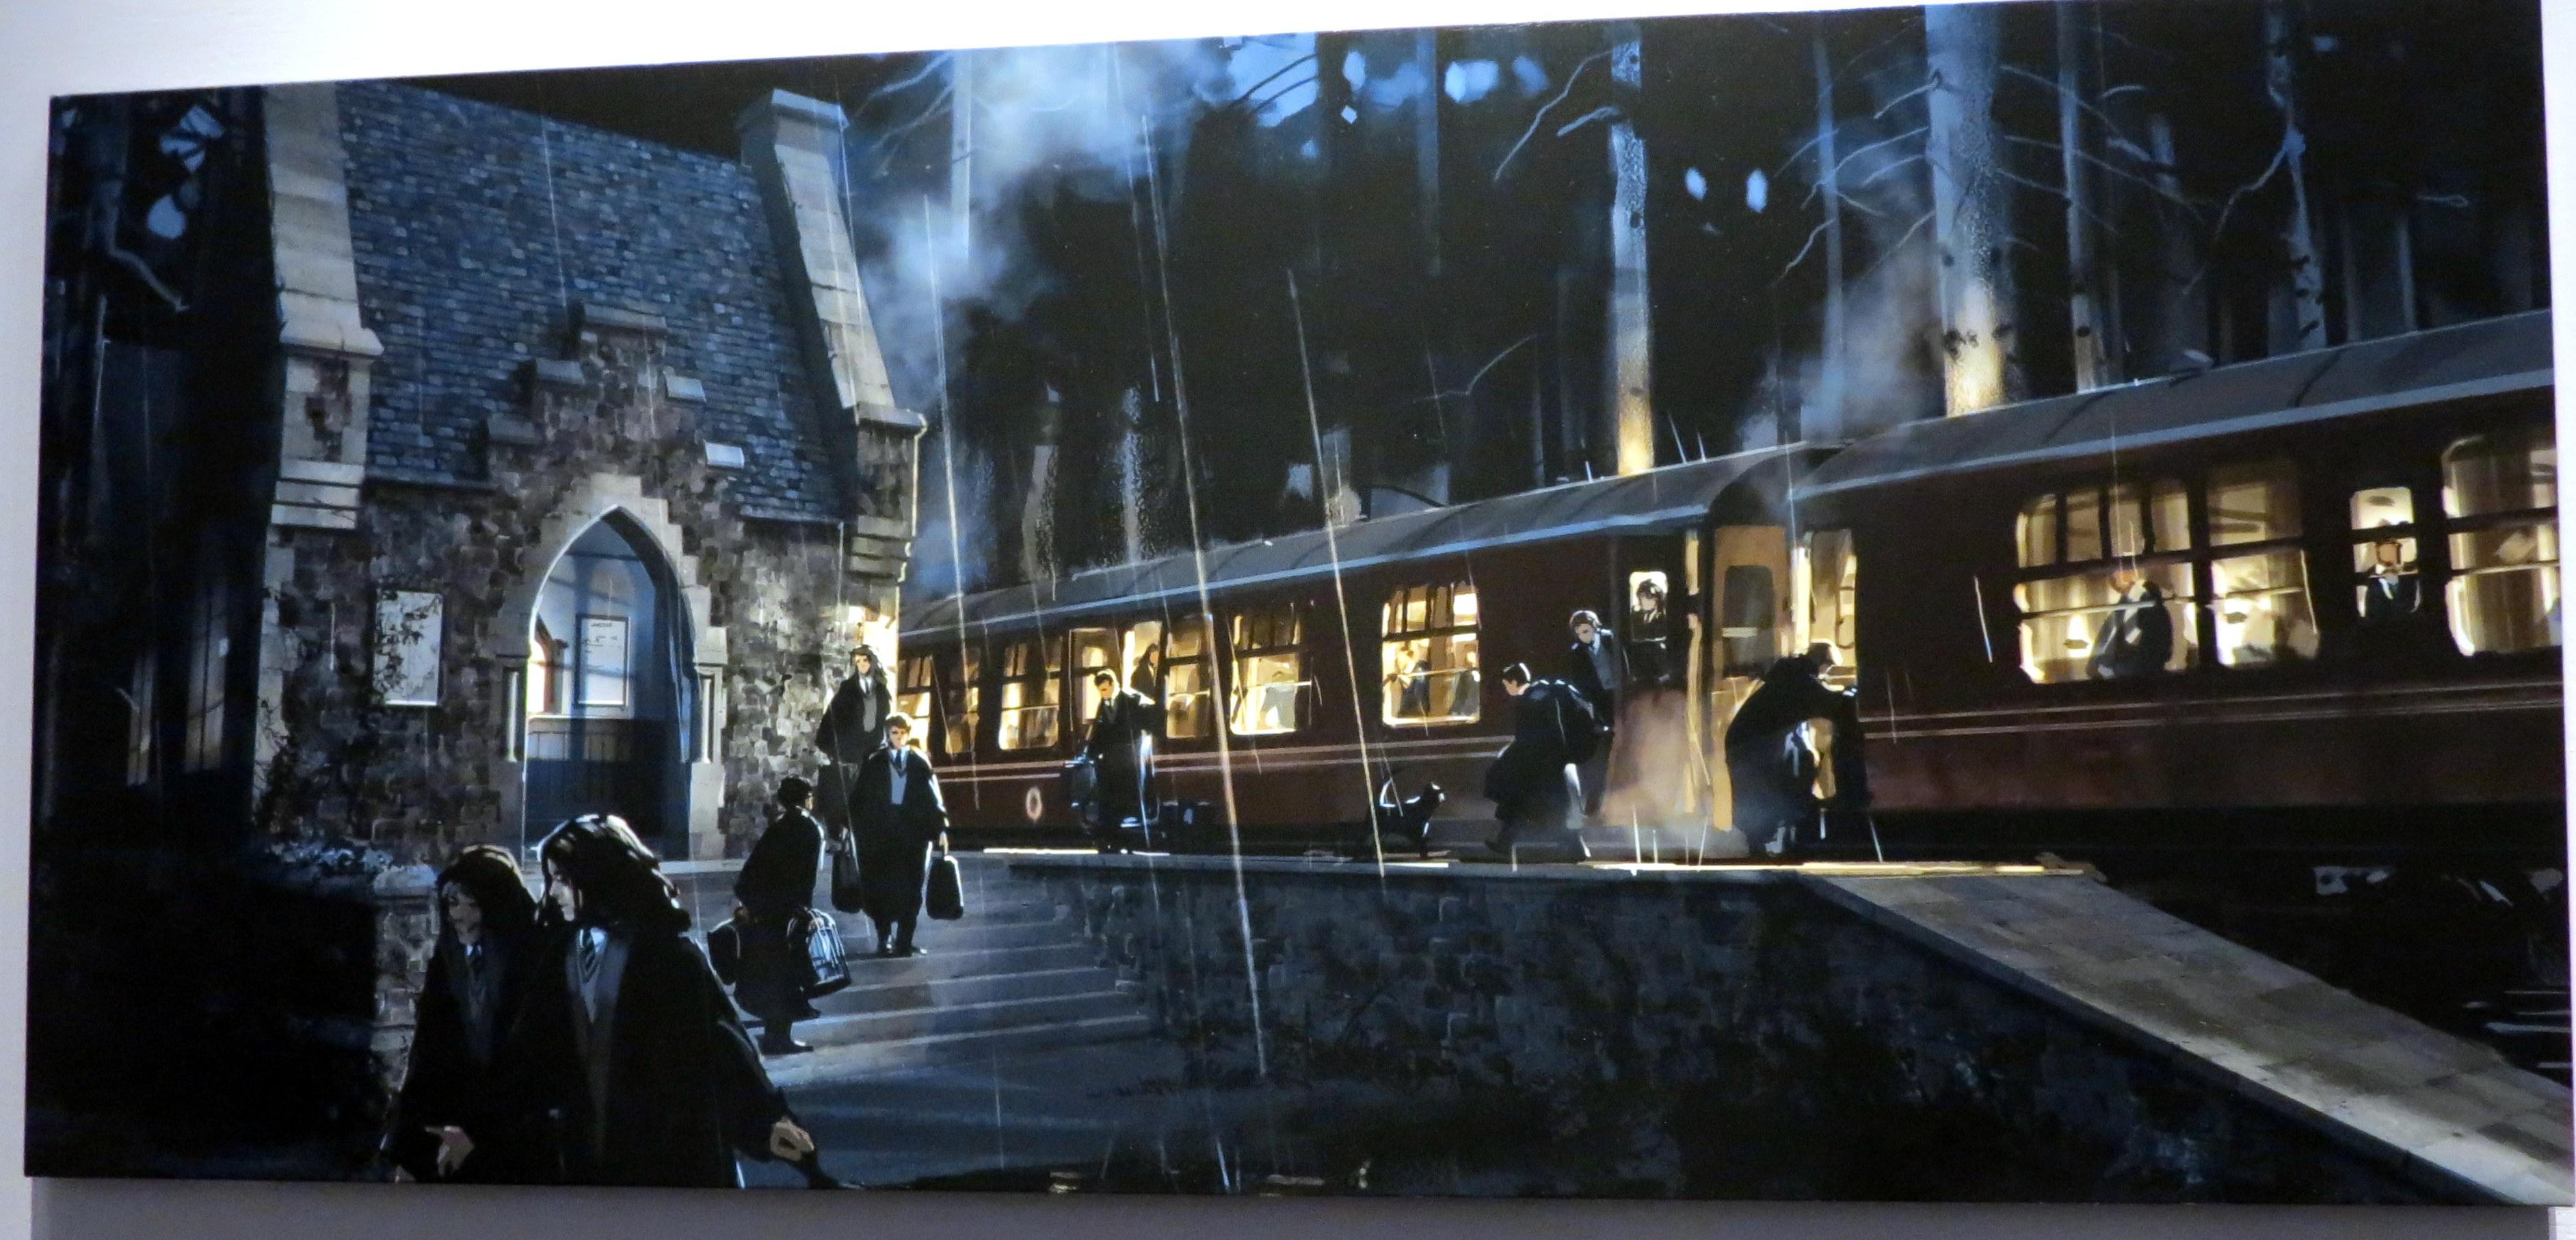 Popular Wallpaper Harry Potter Concept Art - concept_artist_andrew_williamson_harry_potter_tour_by_sceptre63-d8gf27q  Trends_51962.jpg